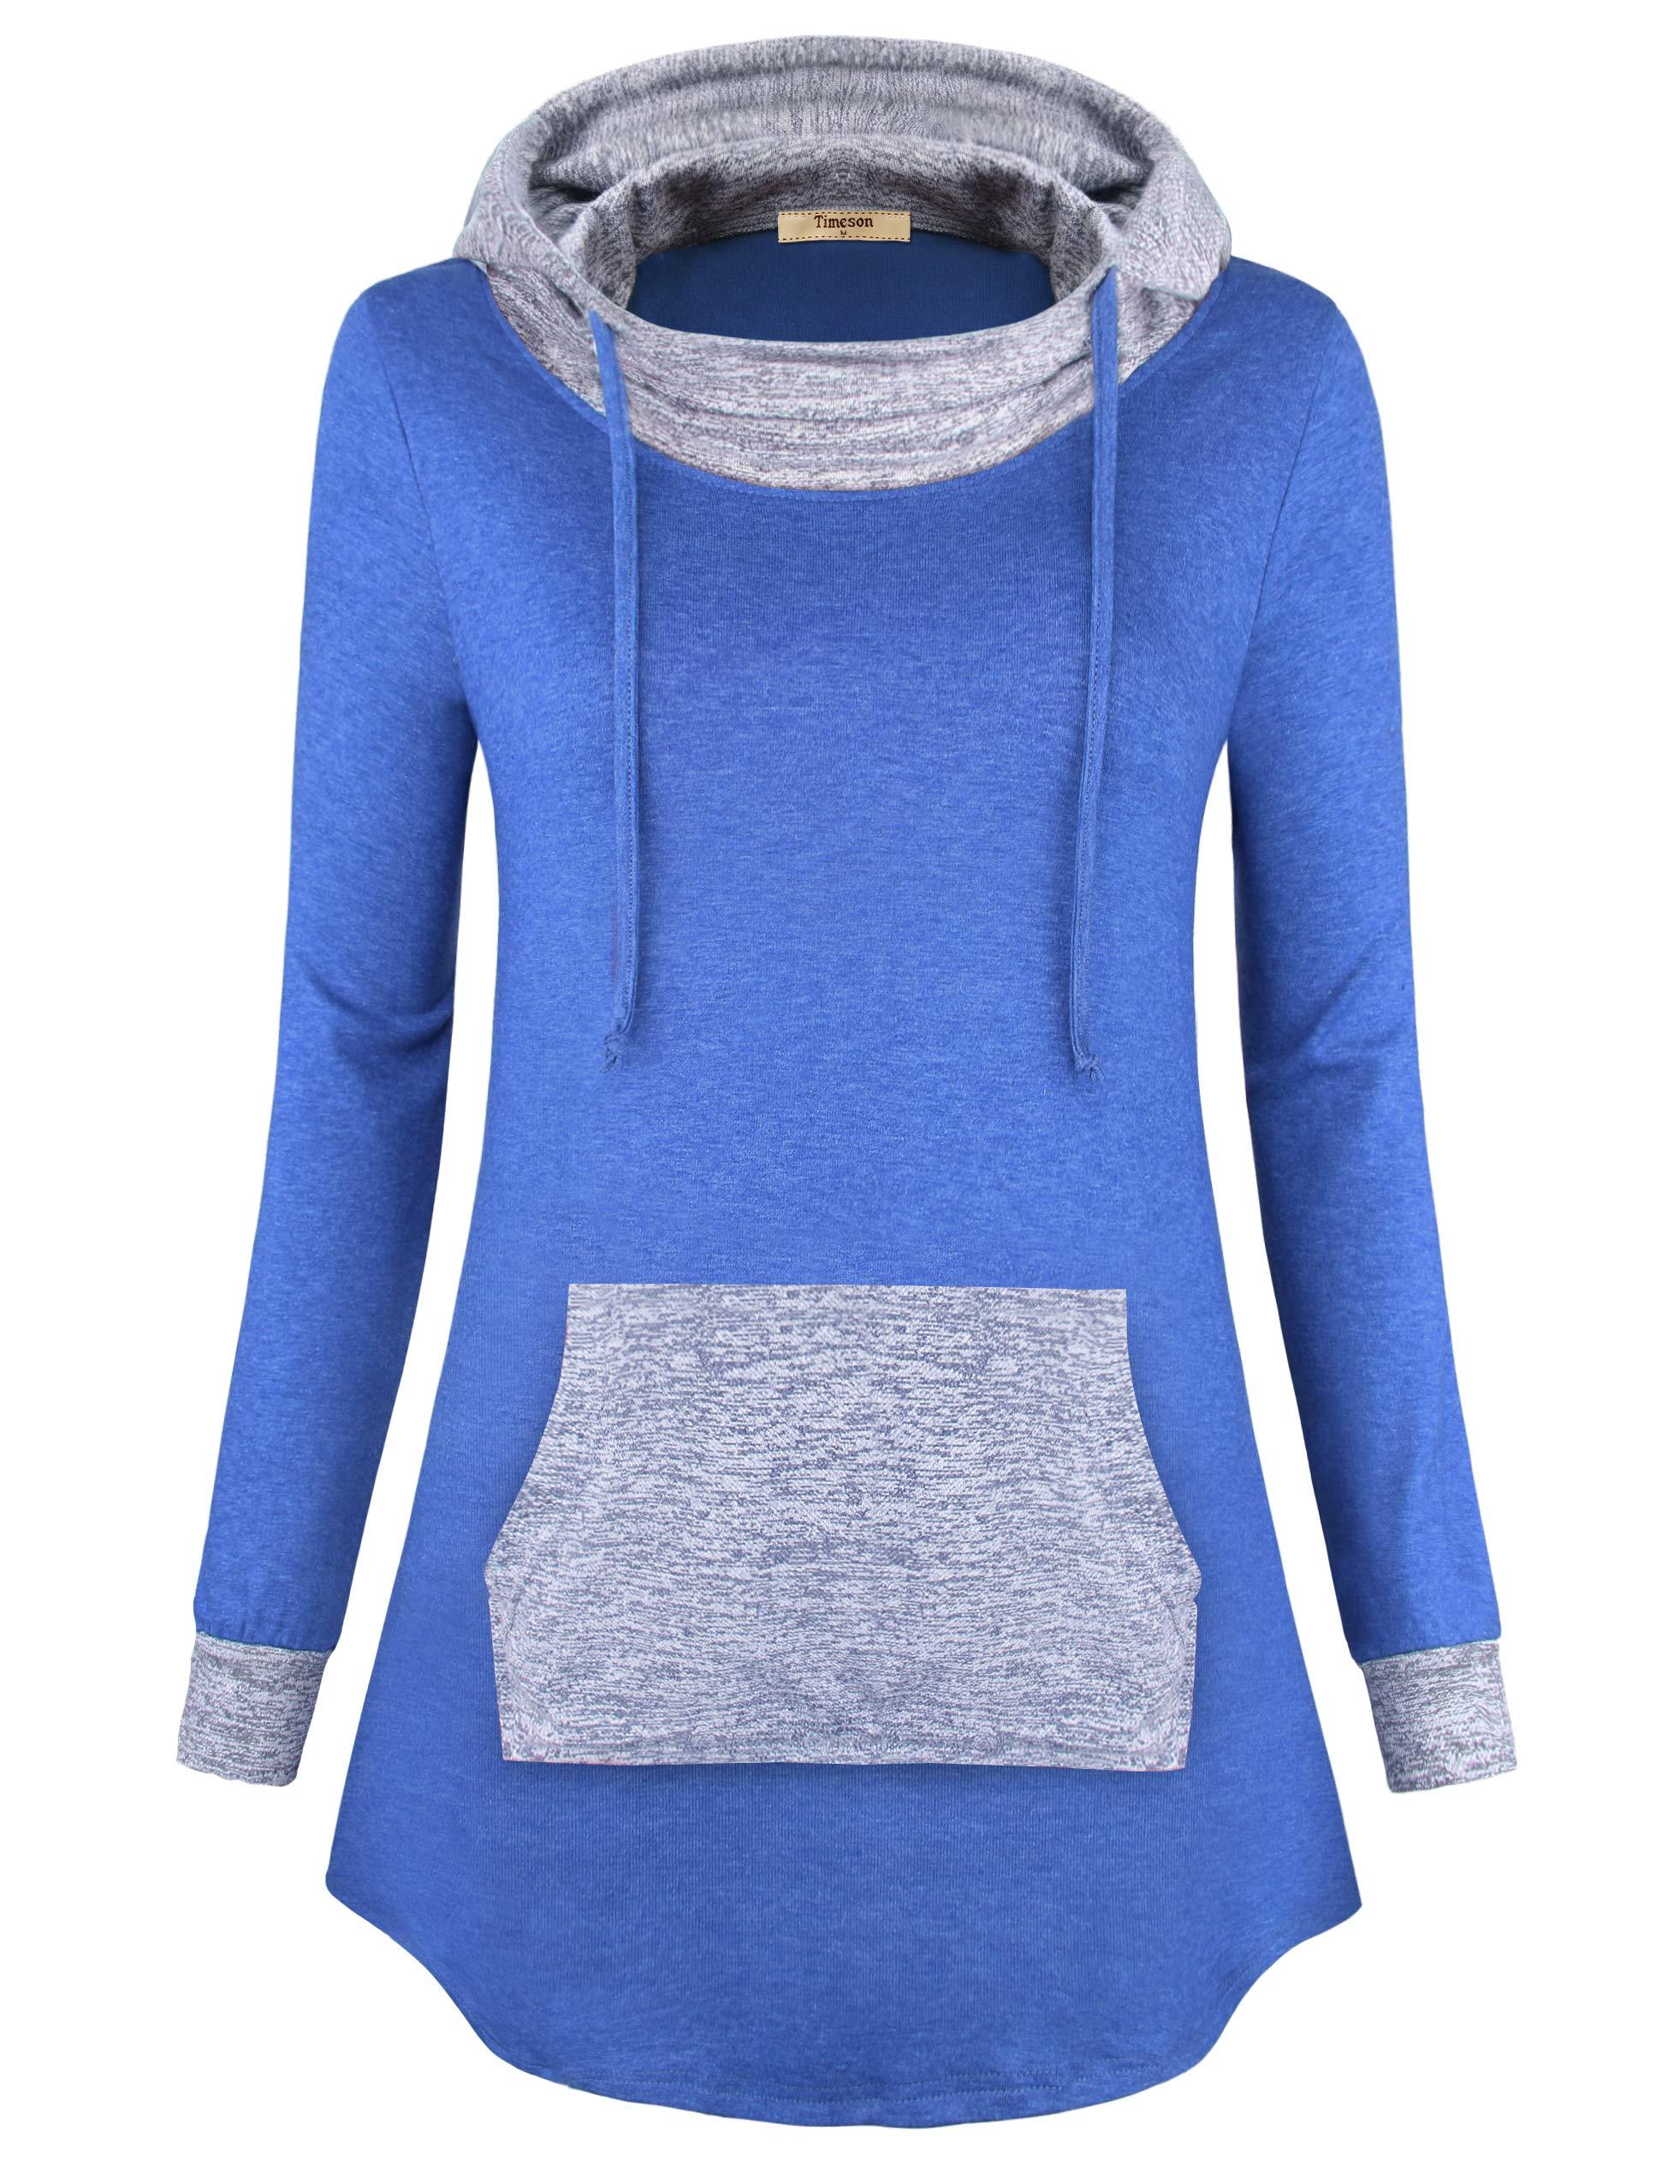 Timeson Loose Hoodies for Women, Woman Plus Size Hoody Tunics Cowl Neck Thin Sweatshirts Wear to Work Fashion Comfy Tunic Hoodies Shirt for Casual Business Work Blue Medium